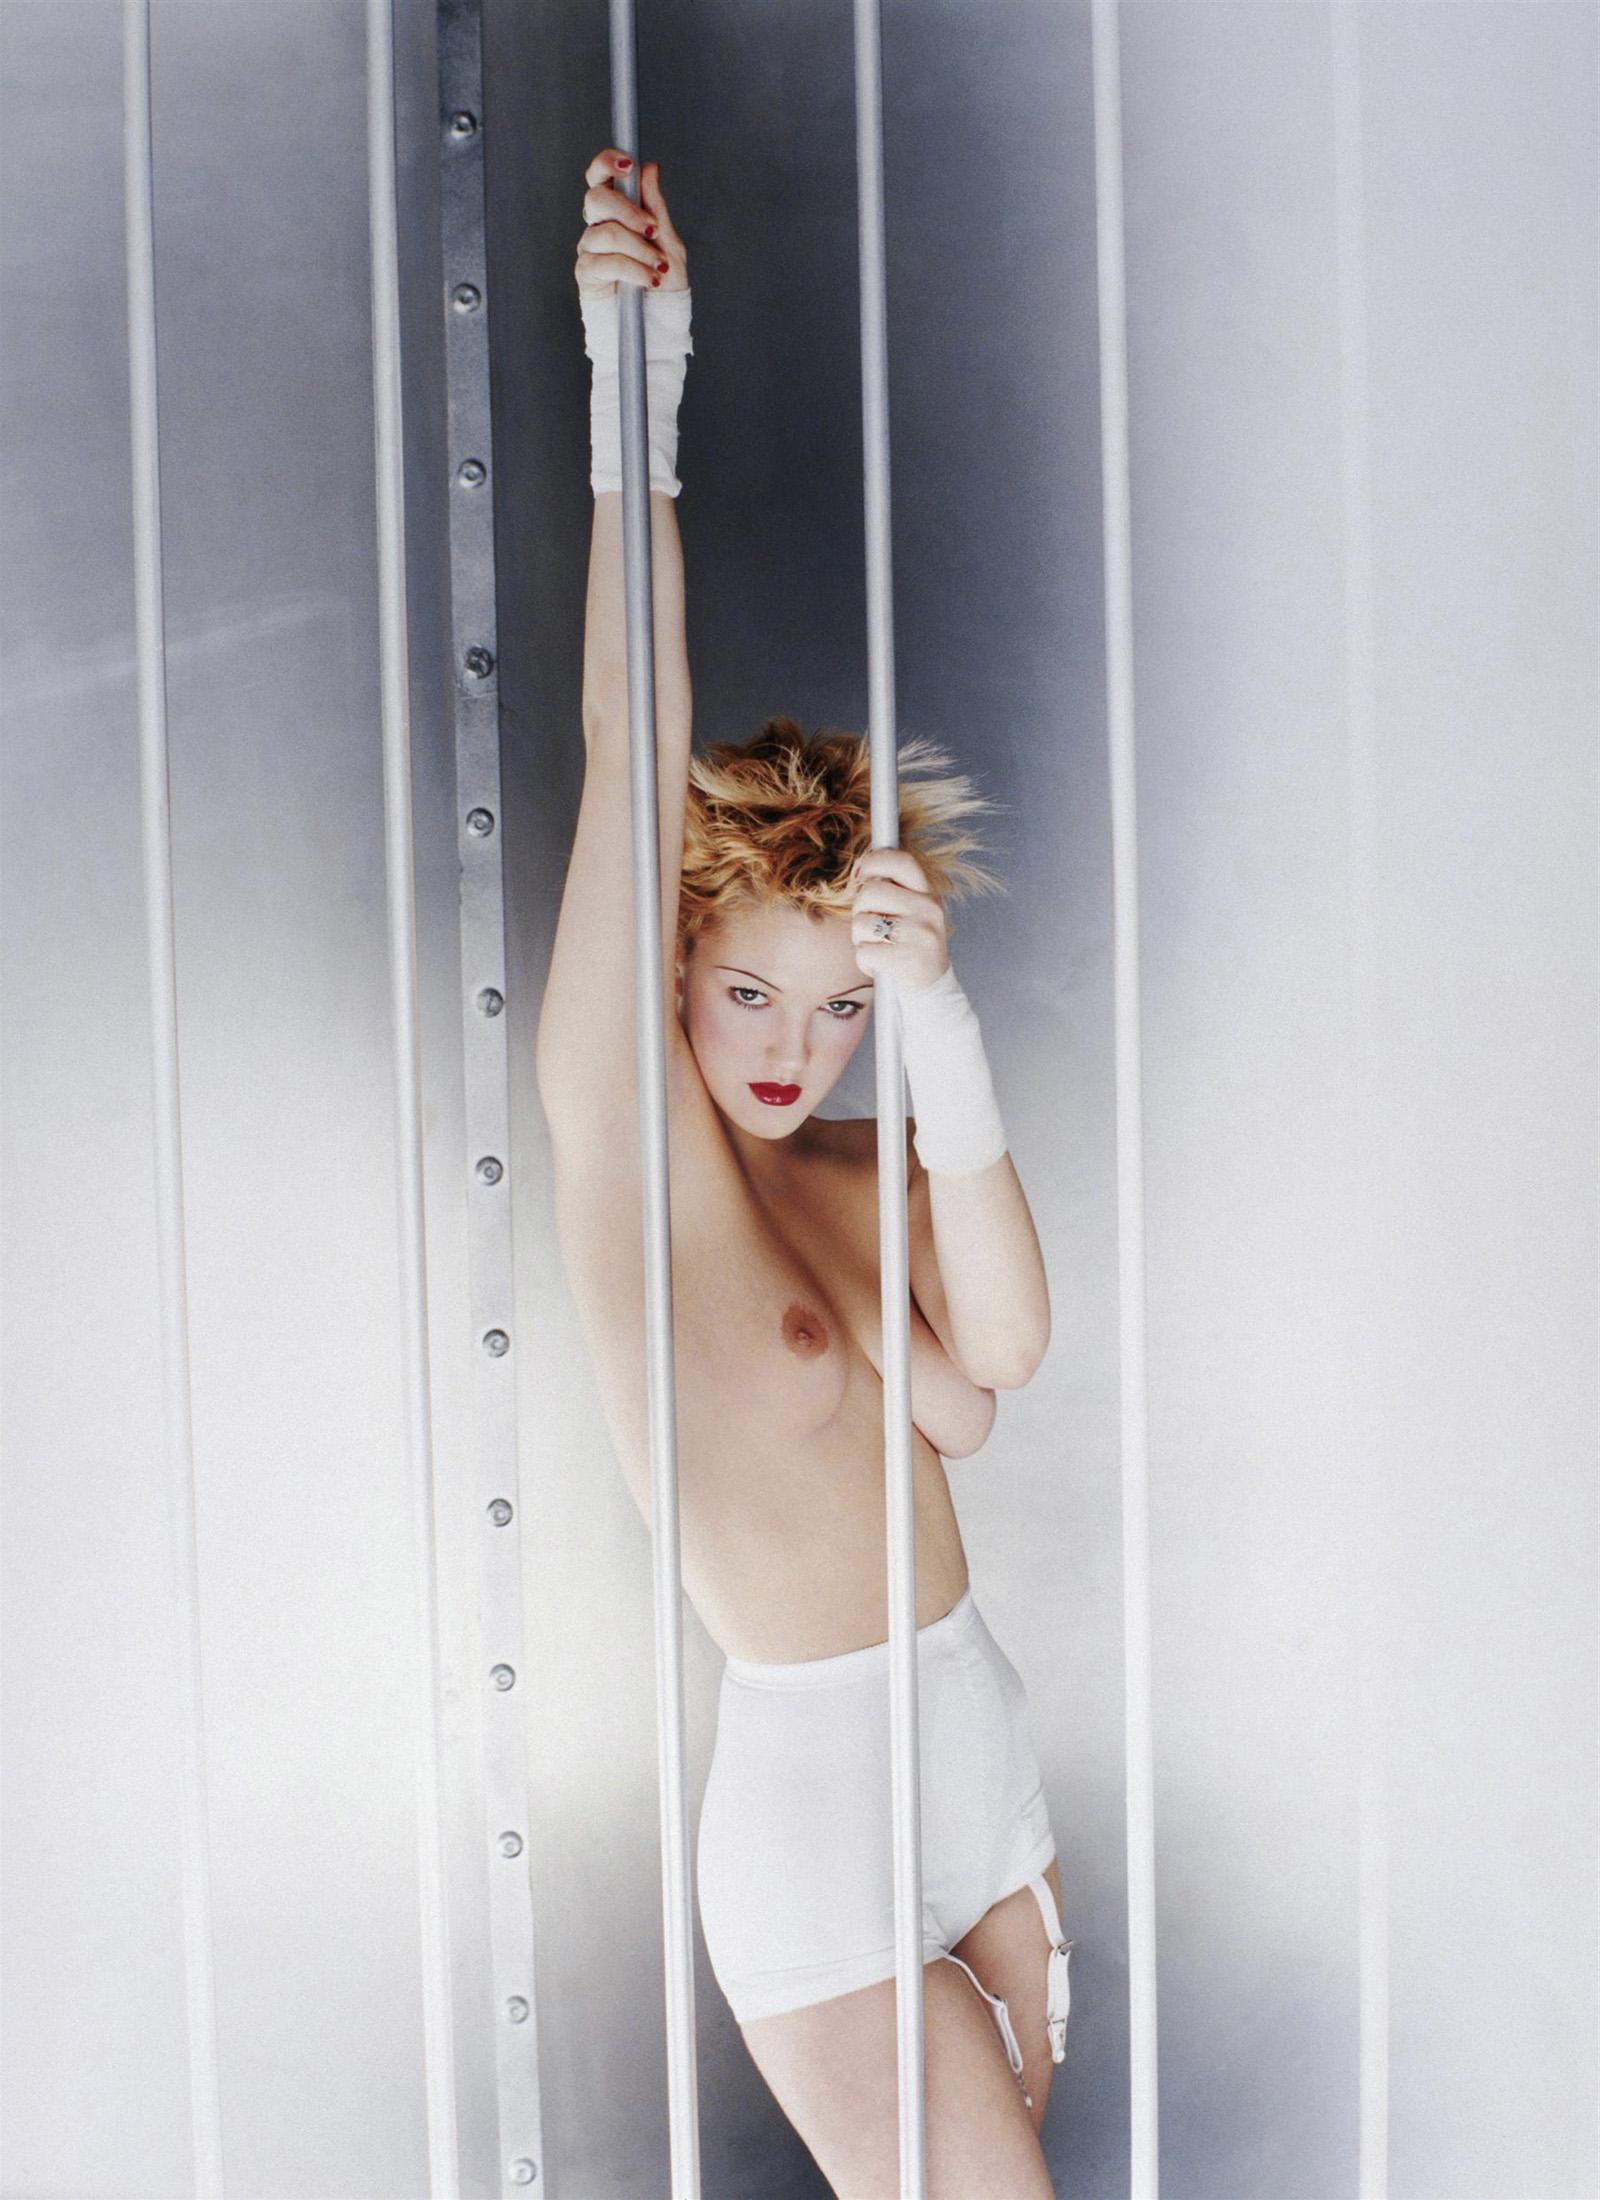 Дрю Бэрримор (Drew Barrymore). Фотосессия для журнала Premiere (1995